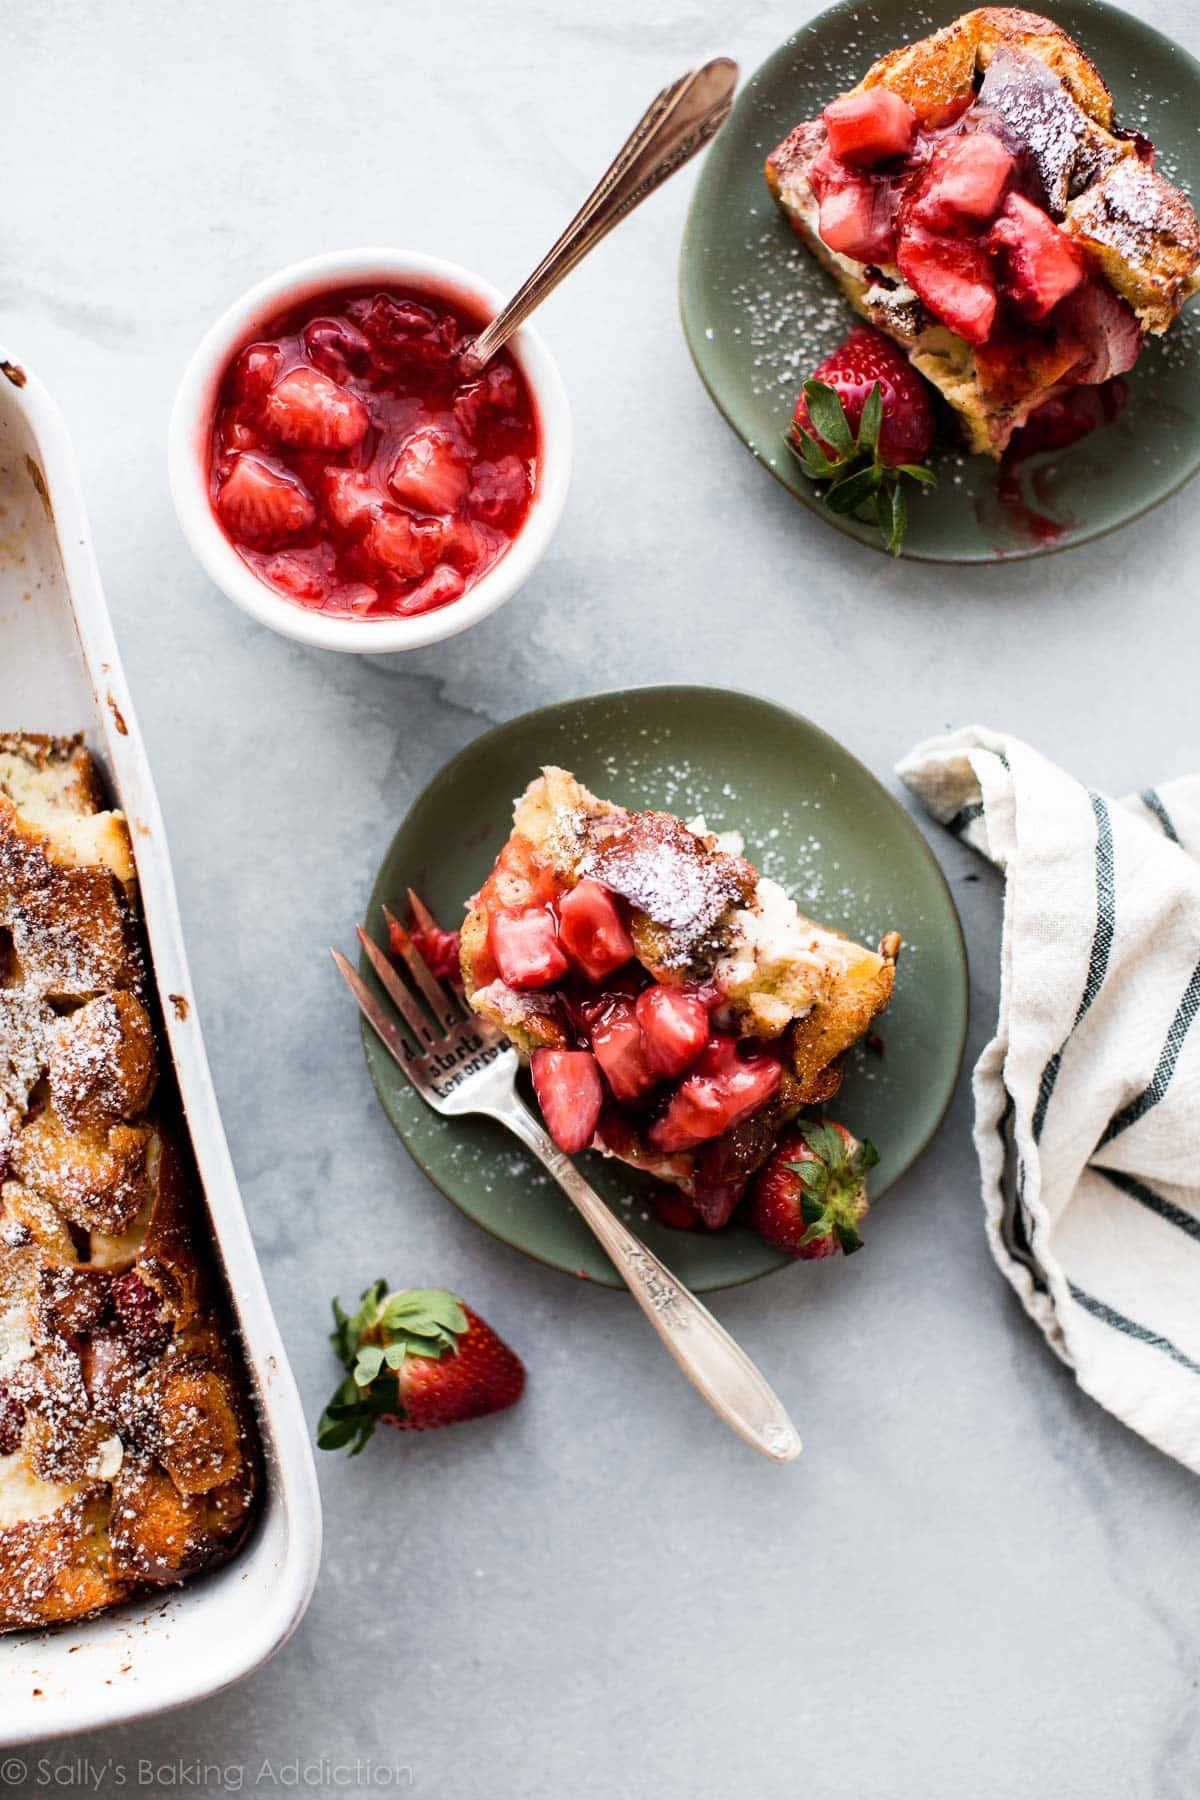 Creamy, fresh, and custard-y Strawberries n Cream French Toast Casserole! Make it ahead the night before! Full recipe on sallysbakingaddiction.com